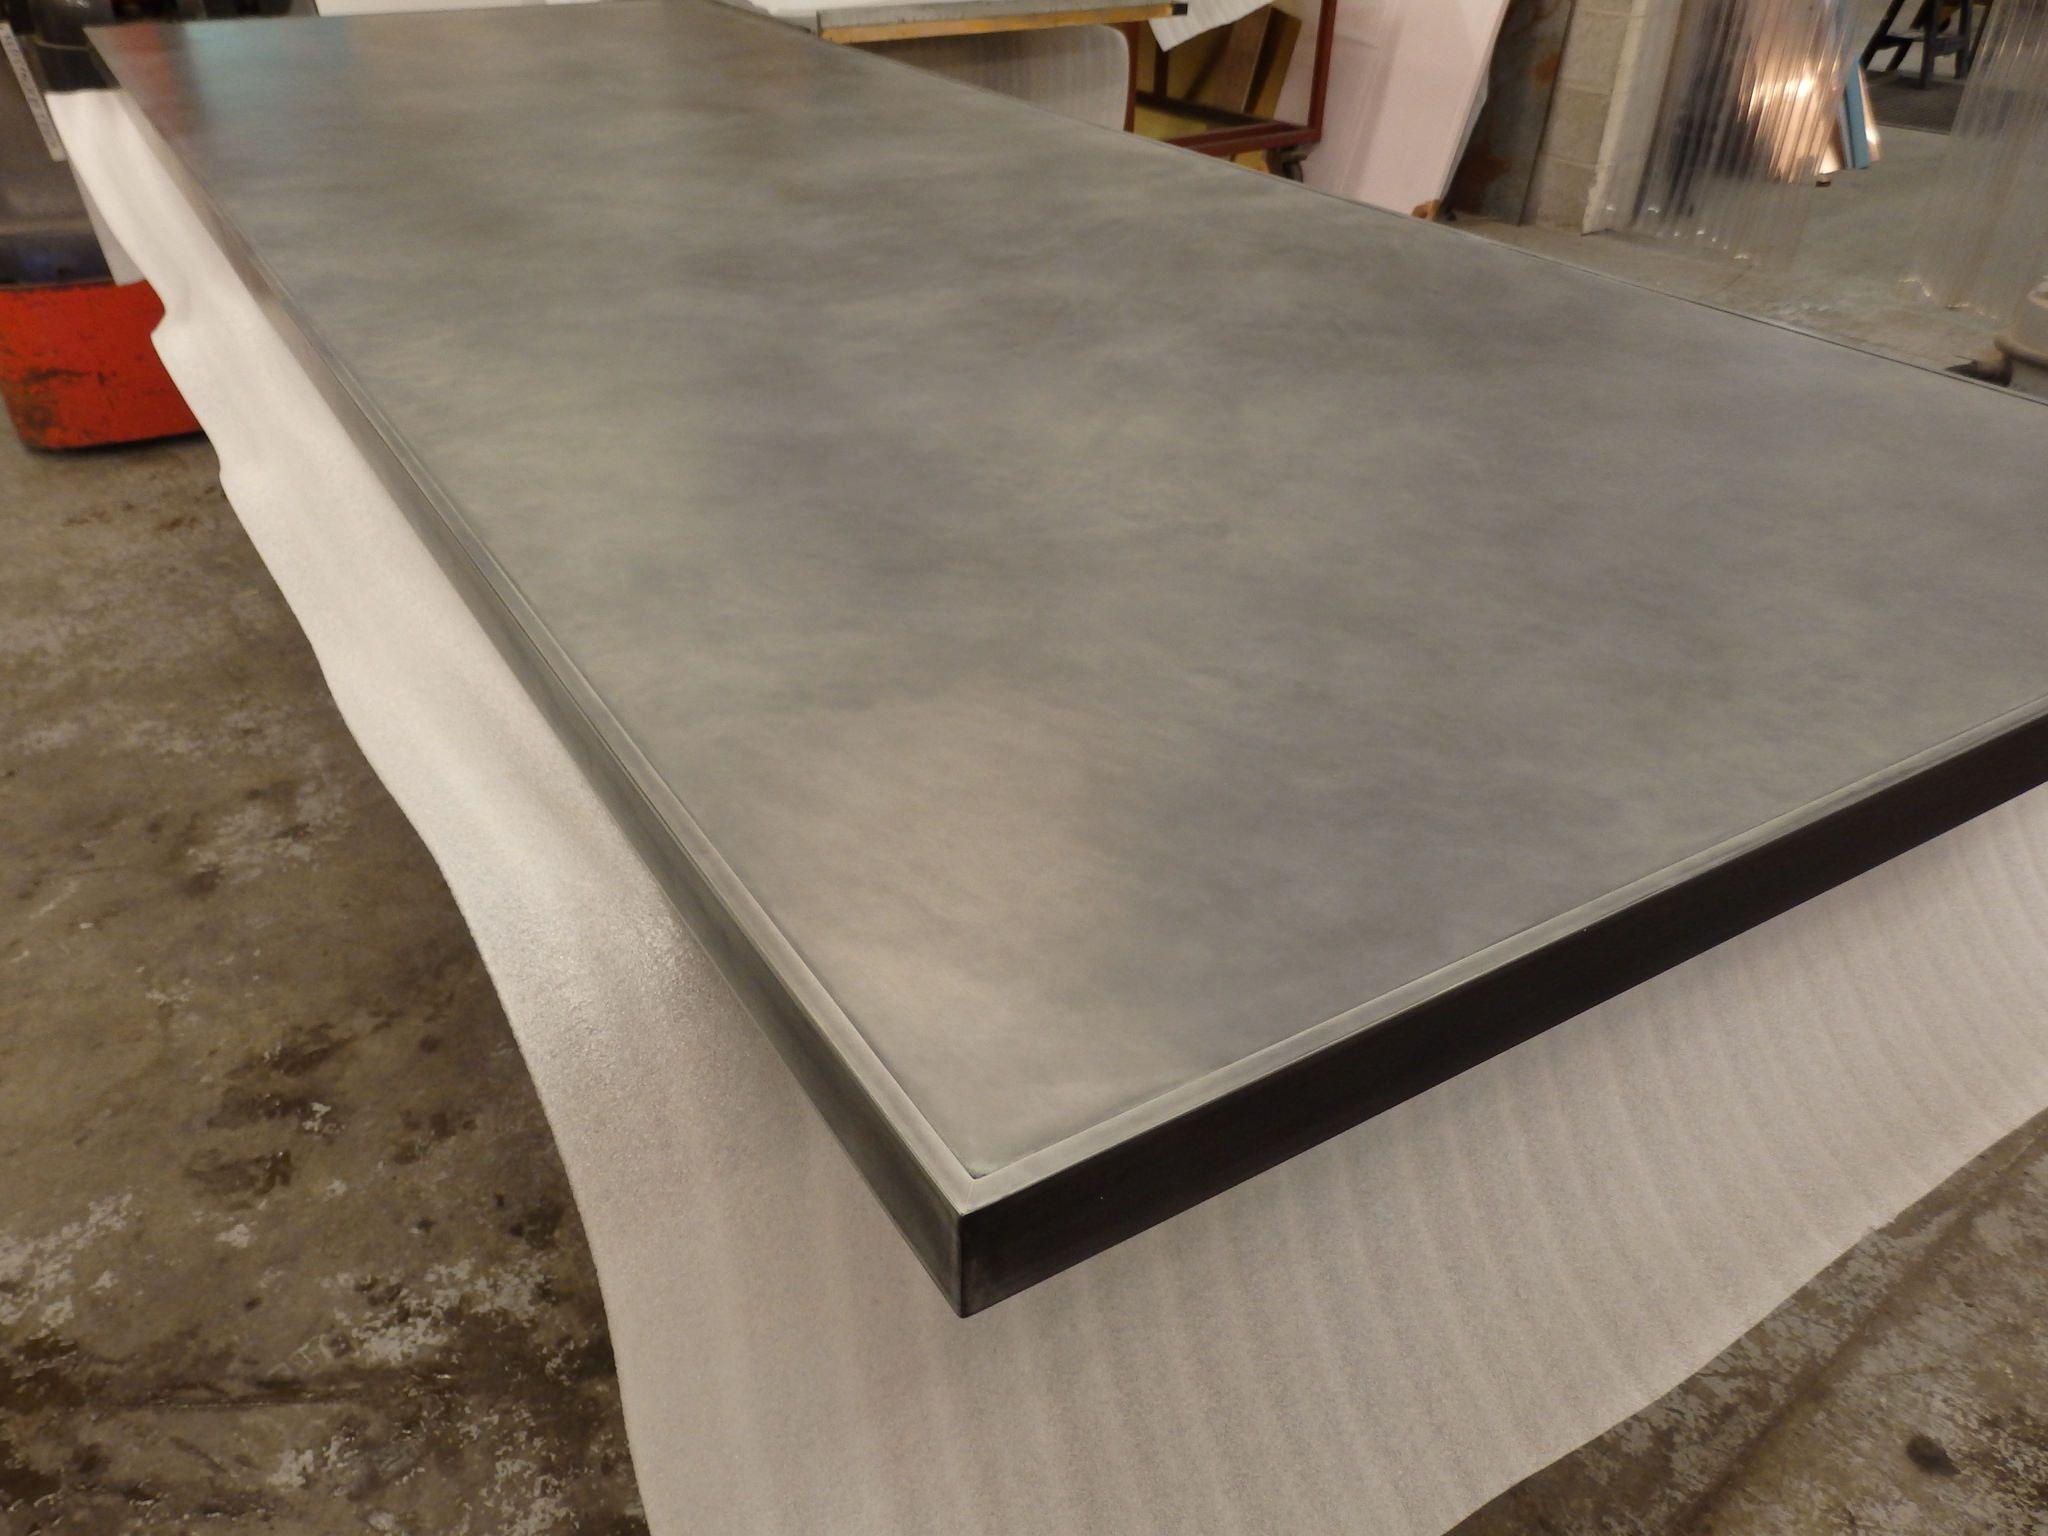 174 Large Zinc Table Top Edge Trimmed Zinc Table Zinc Table Top Zinc Countertops